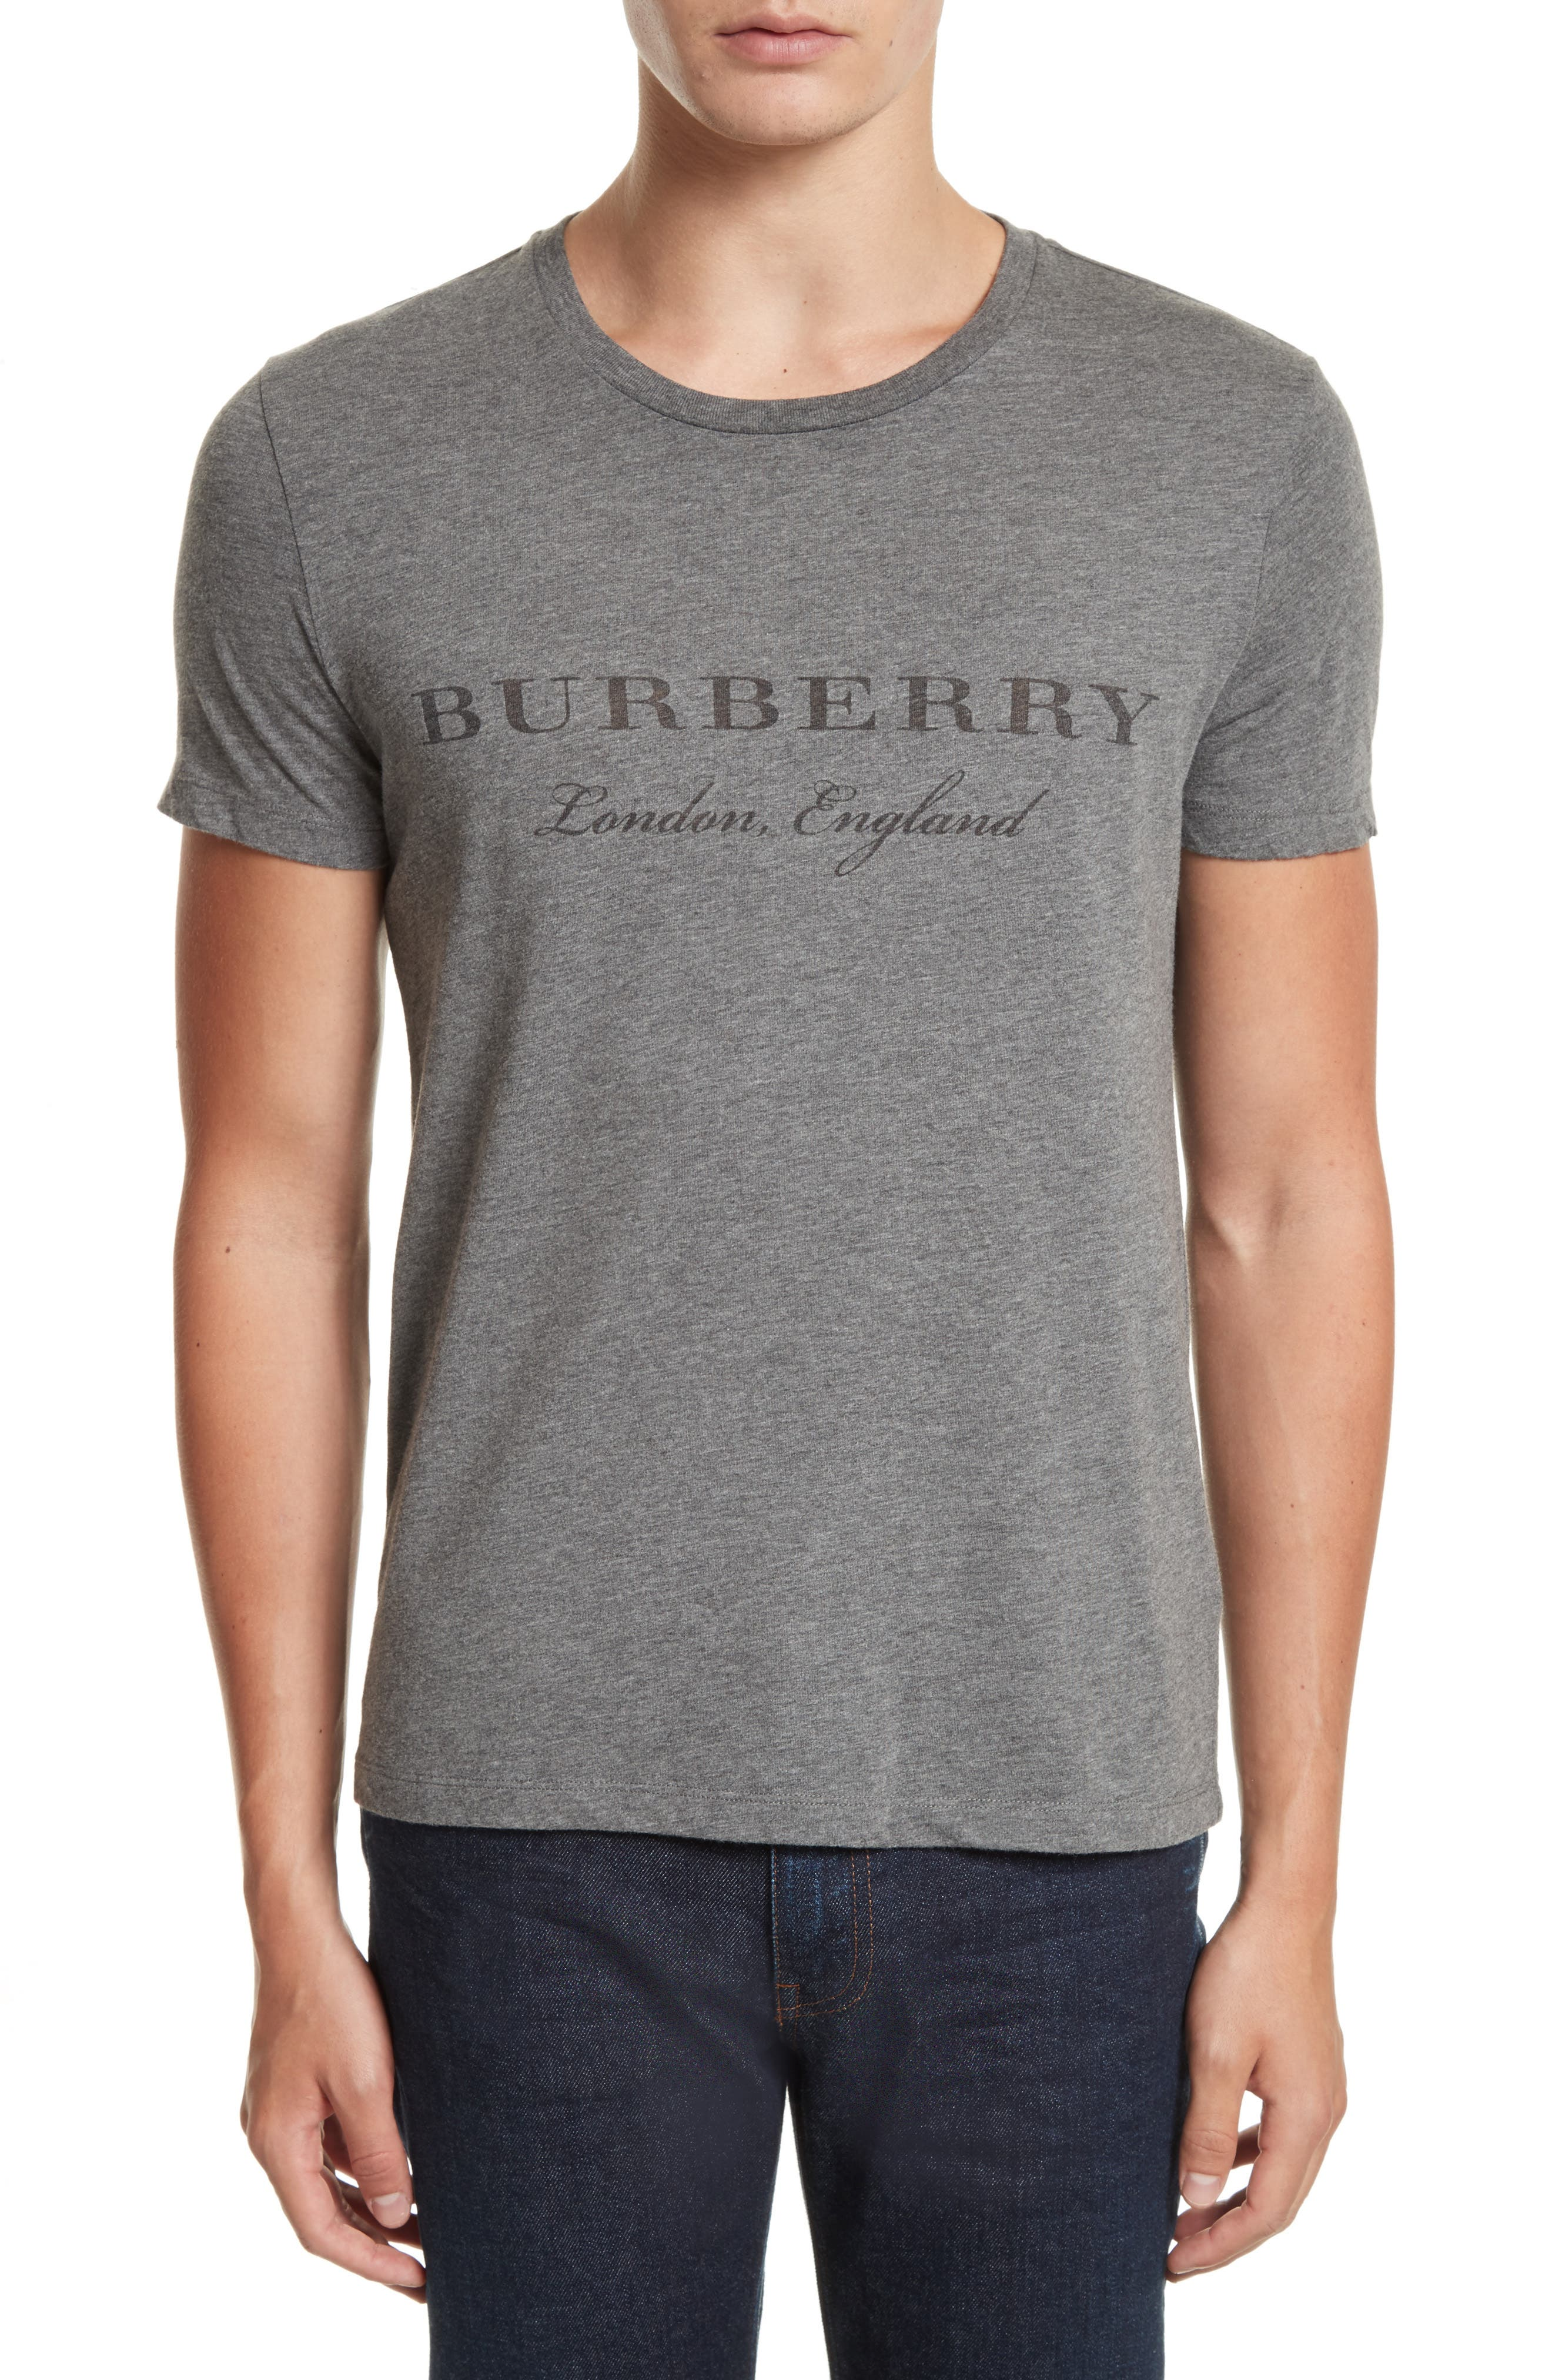 Burberry Martford Regular Fit T-Shirt